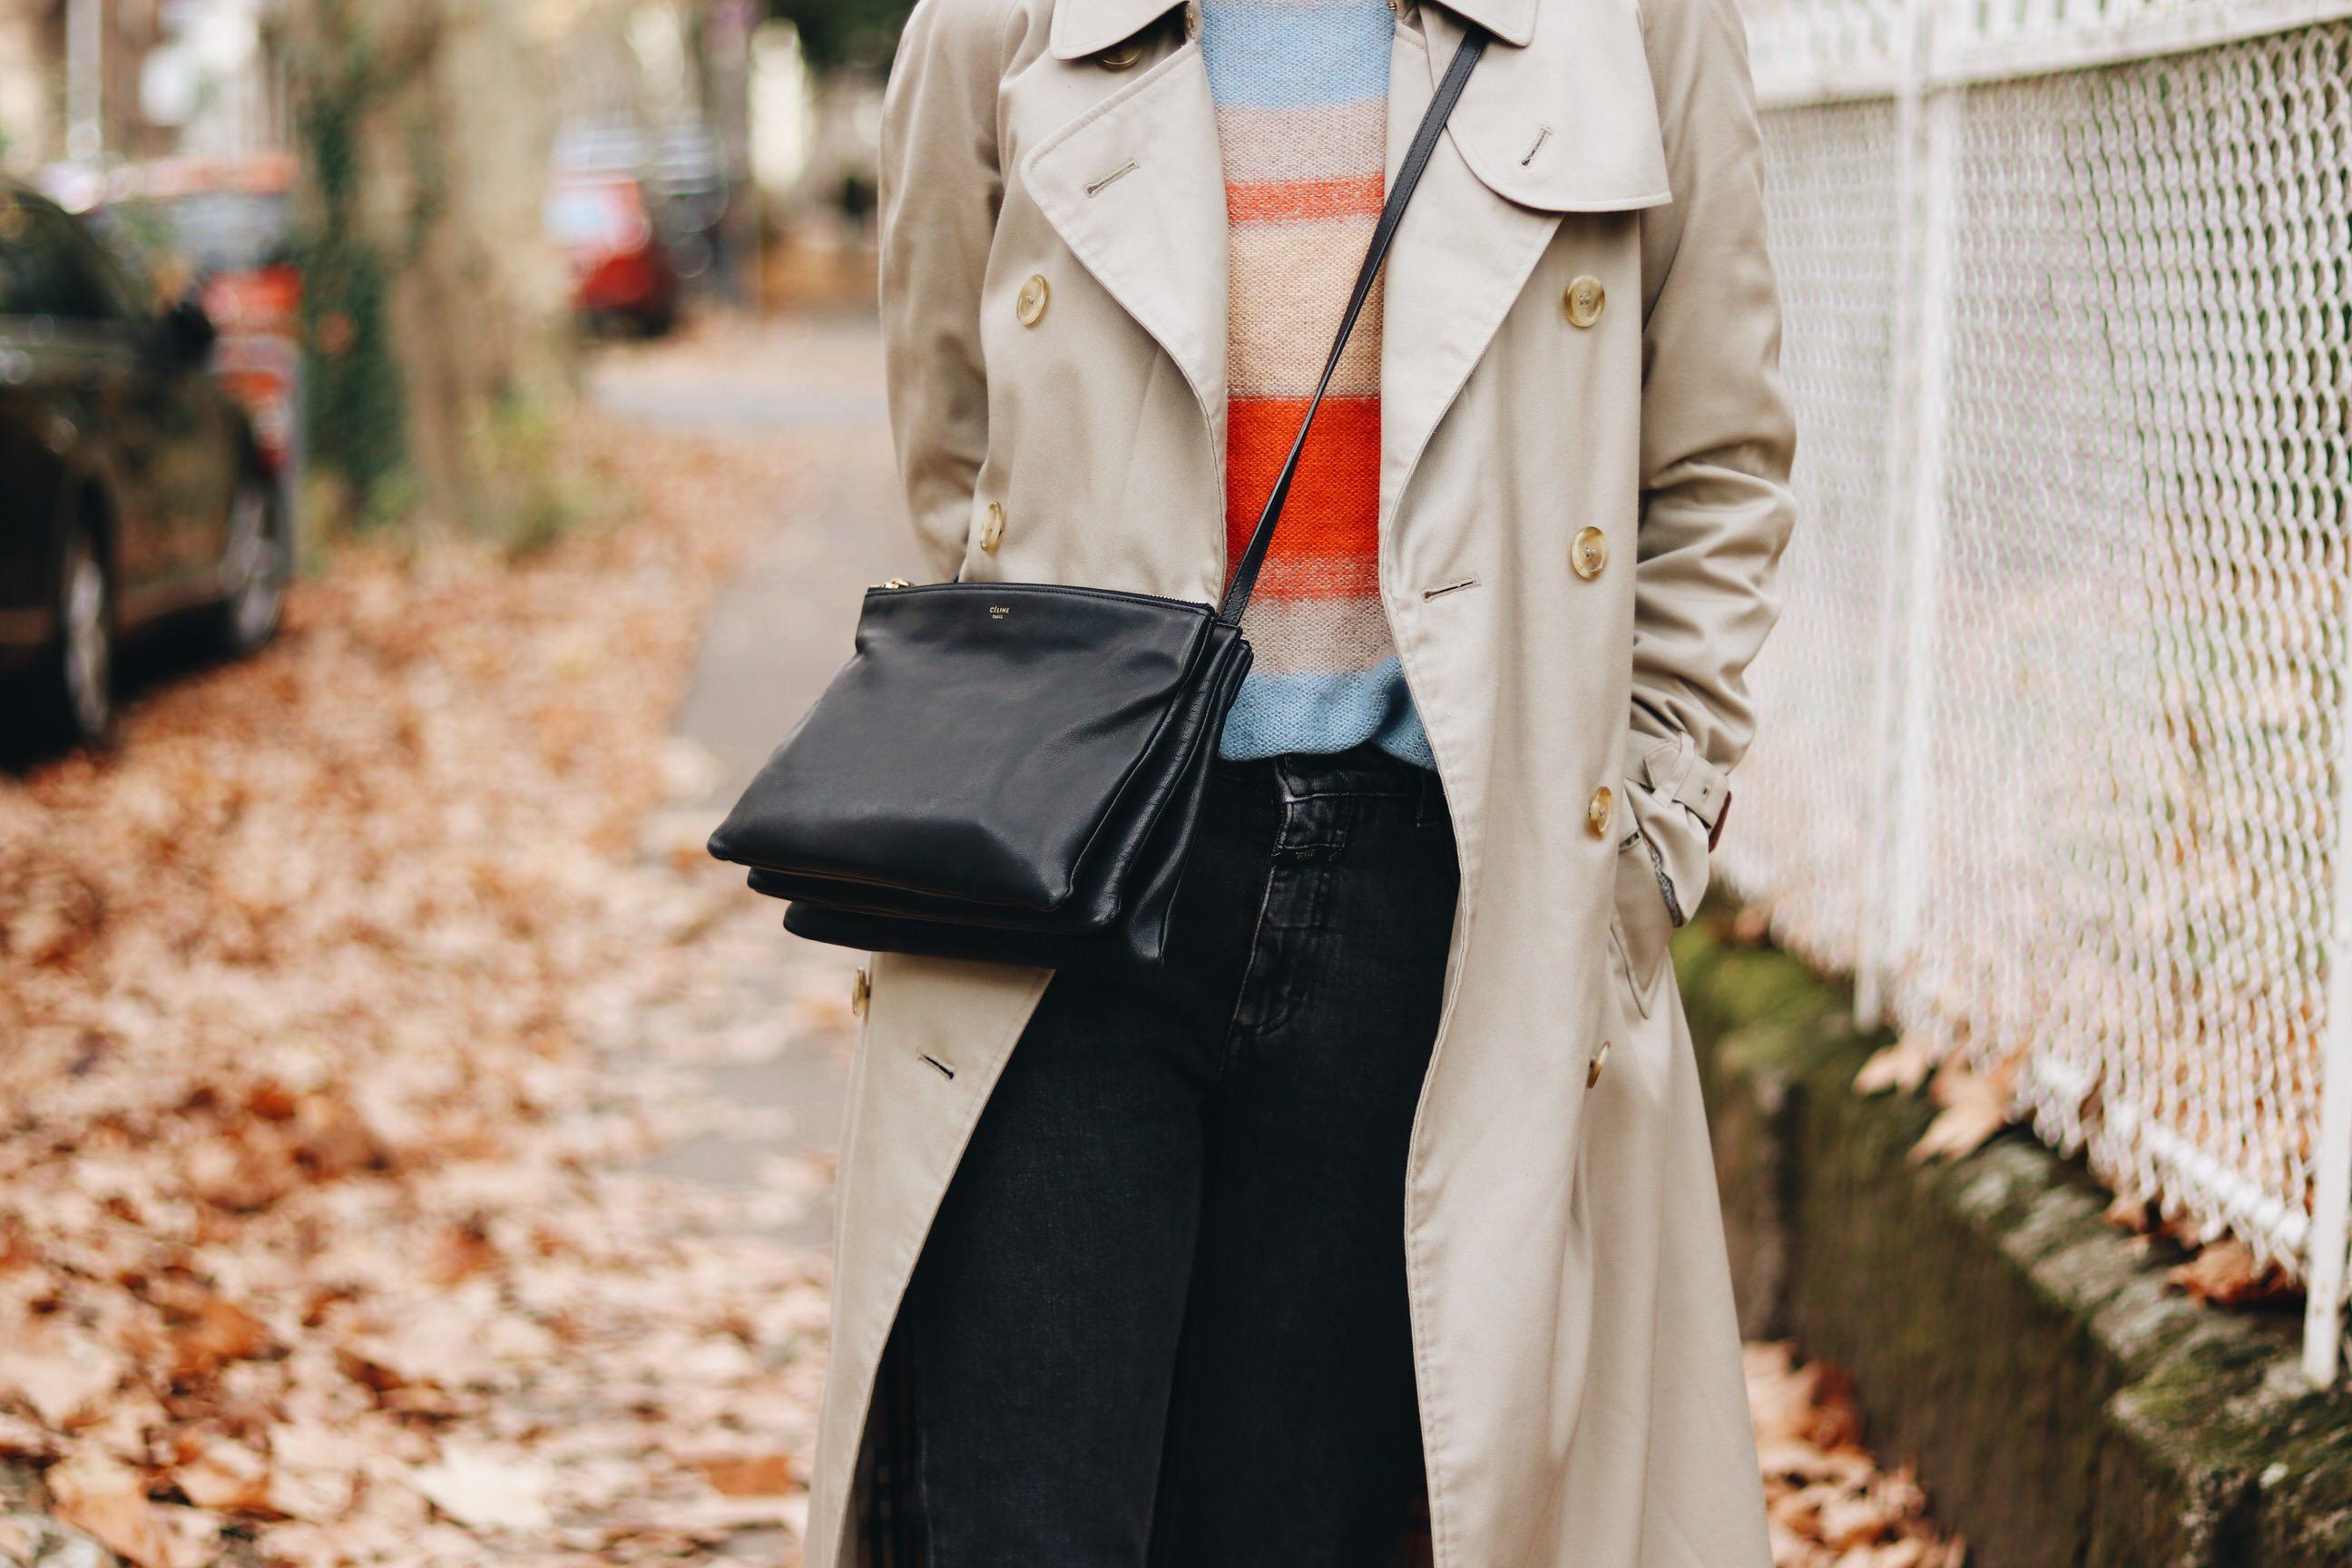 Celine Trio Bag Schwarz Burberry Mantel Herbst Look Modeblog Outfit